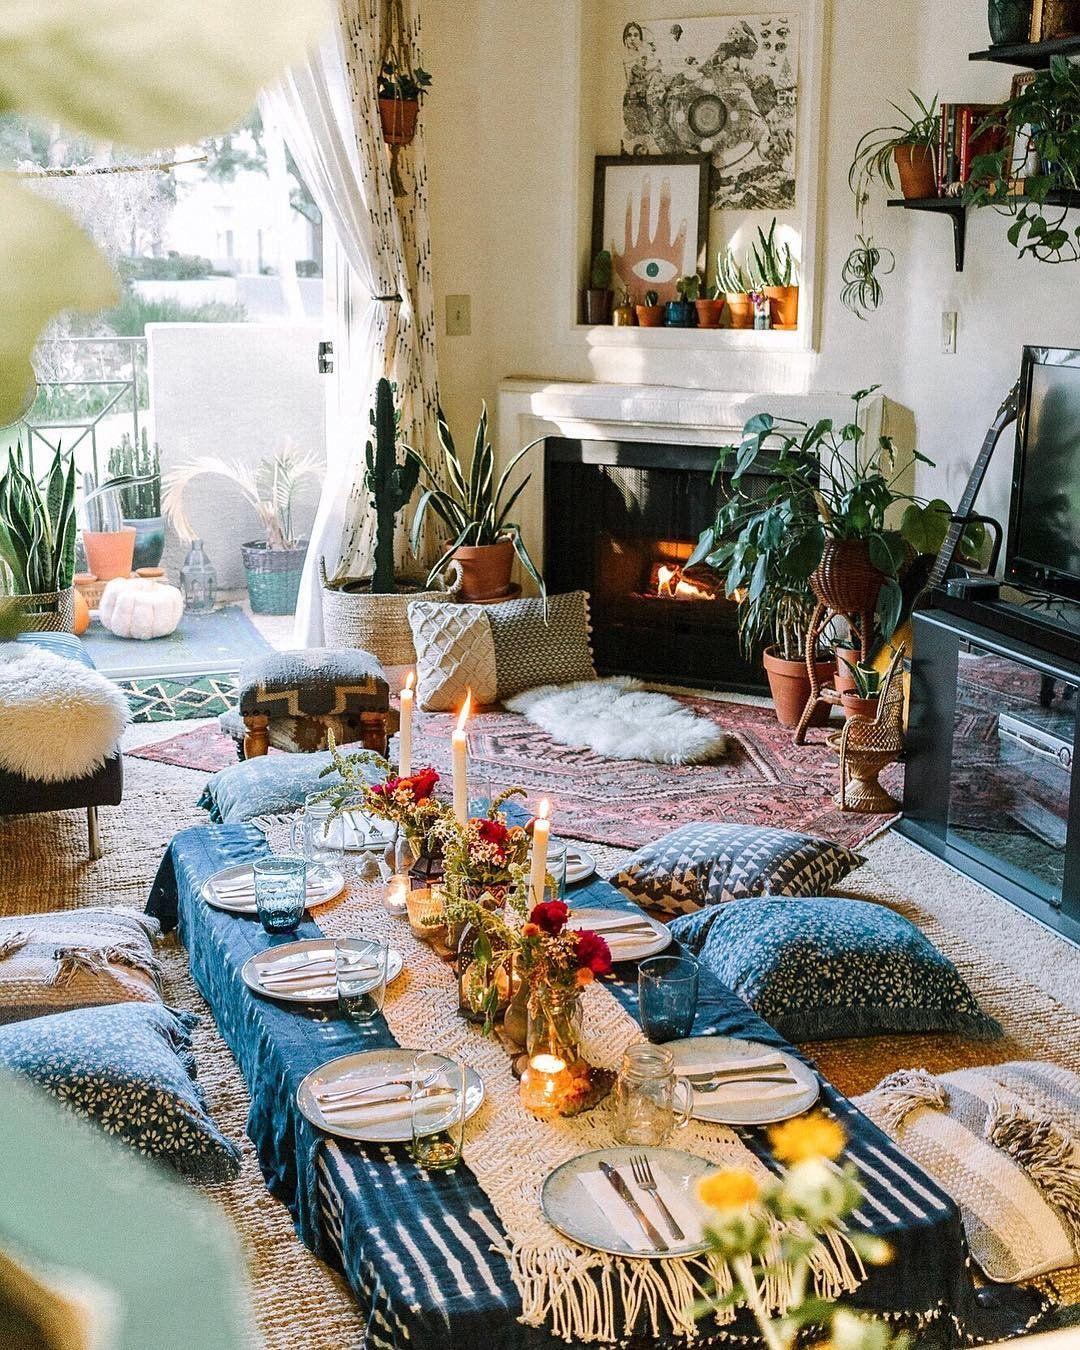 3115 Likes 107 Comments  Sara Toufali Saratoufali On Unique 107 Dining Room Decorating Design